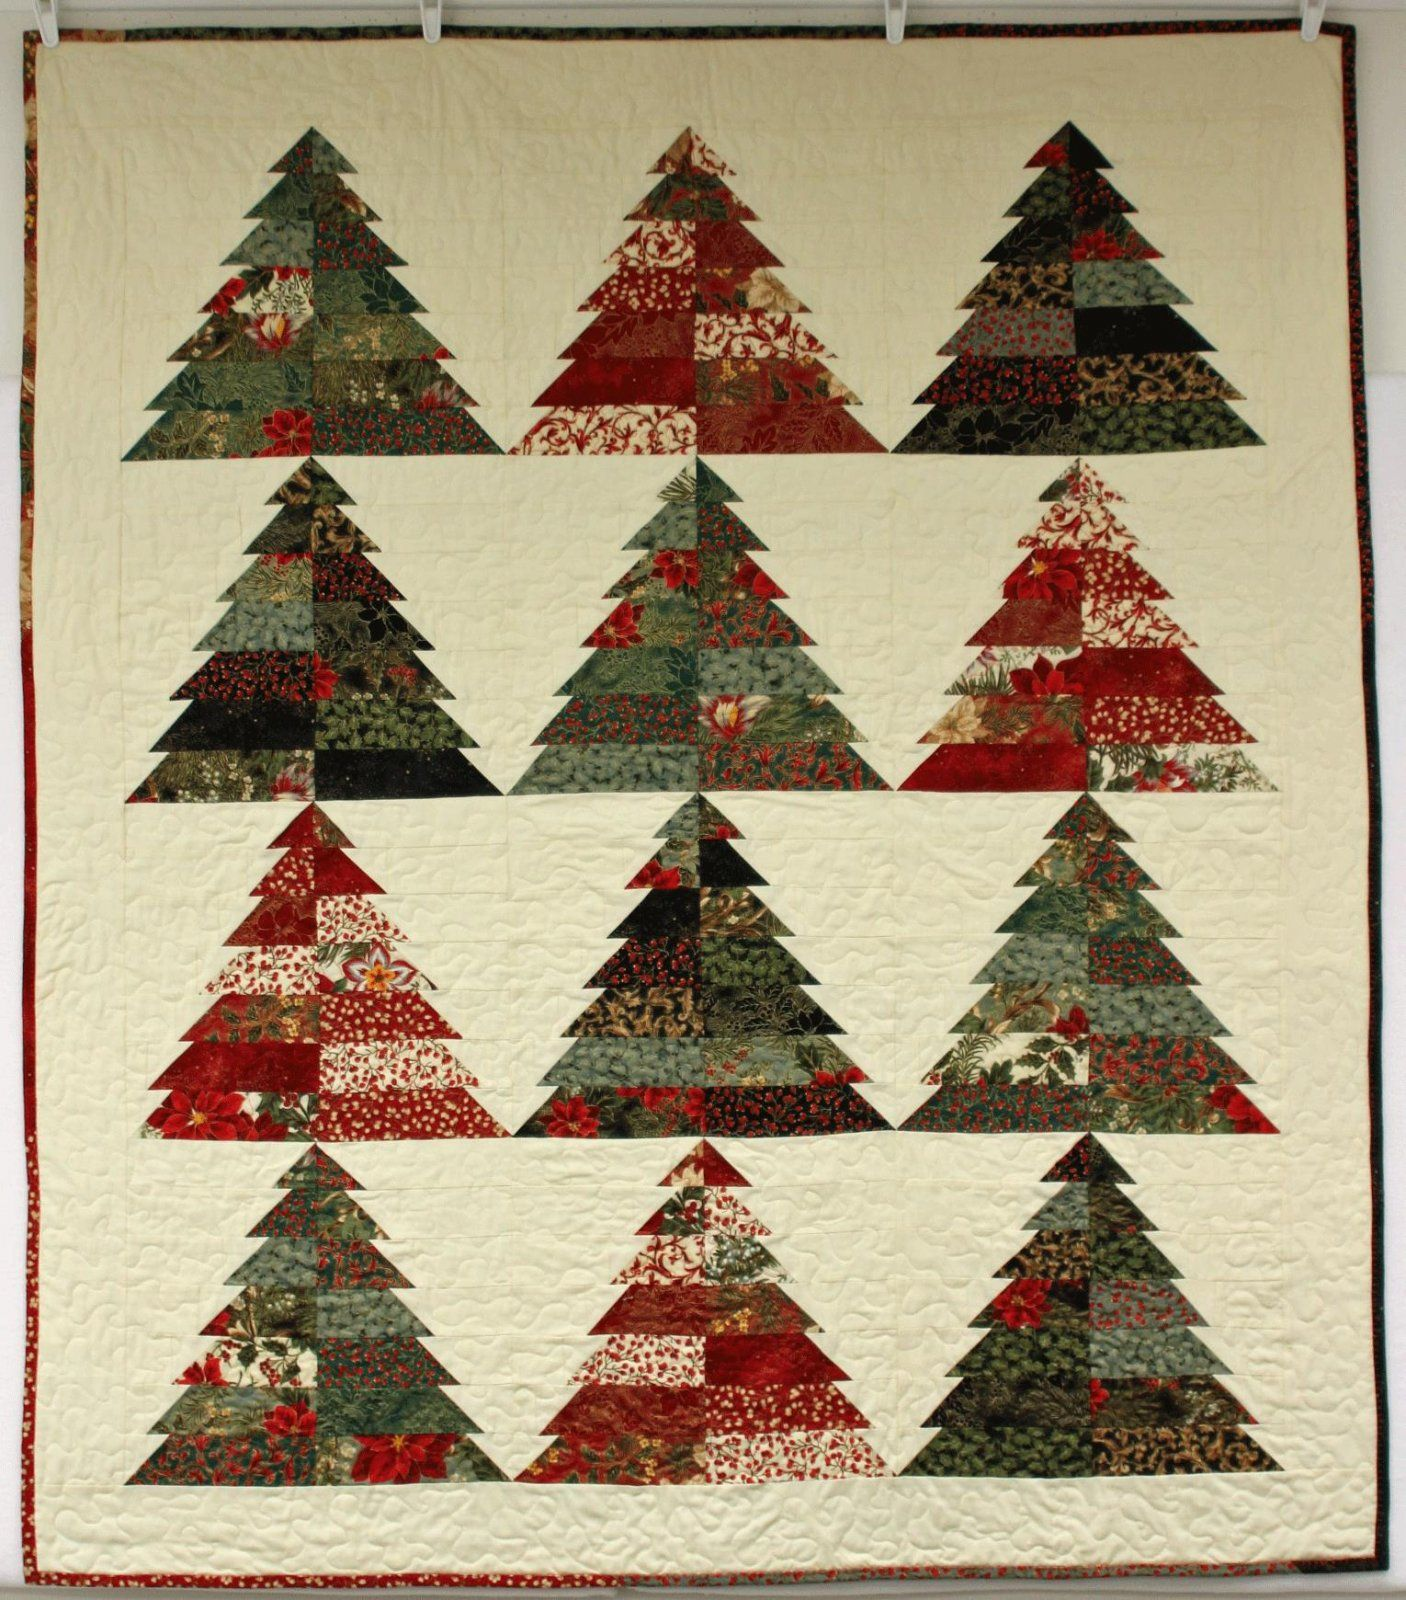 Tree Farm Quilt Pattern Farm Quilt Farm Quilt Patterns Christmas Tree Quilt